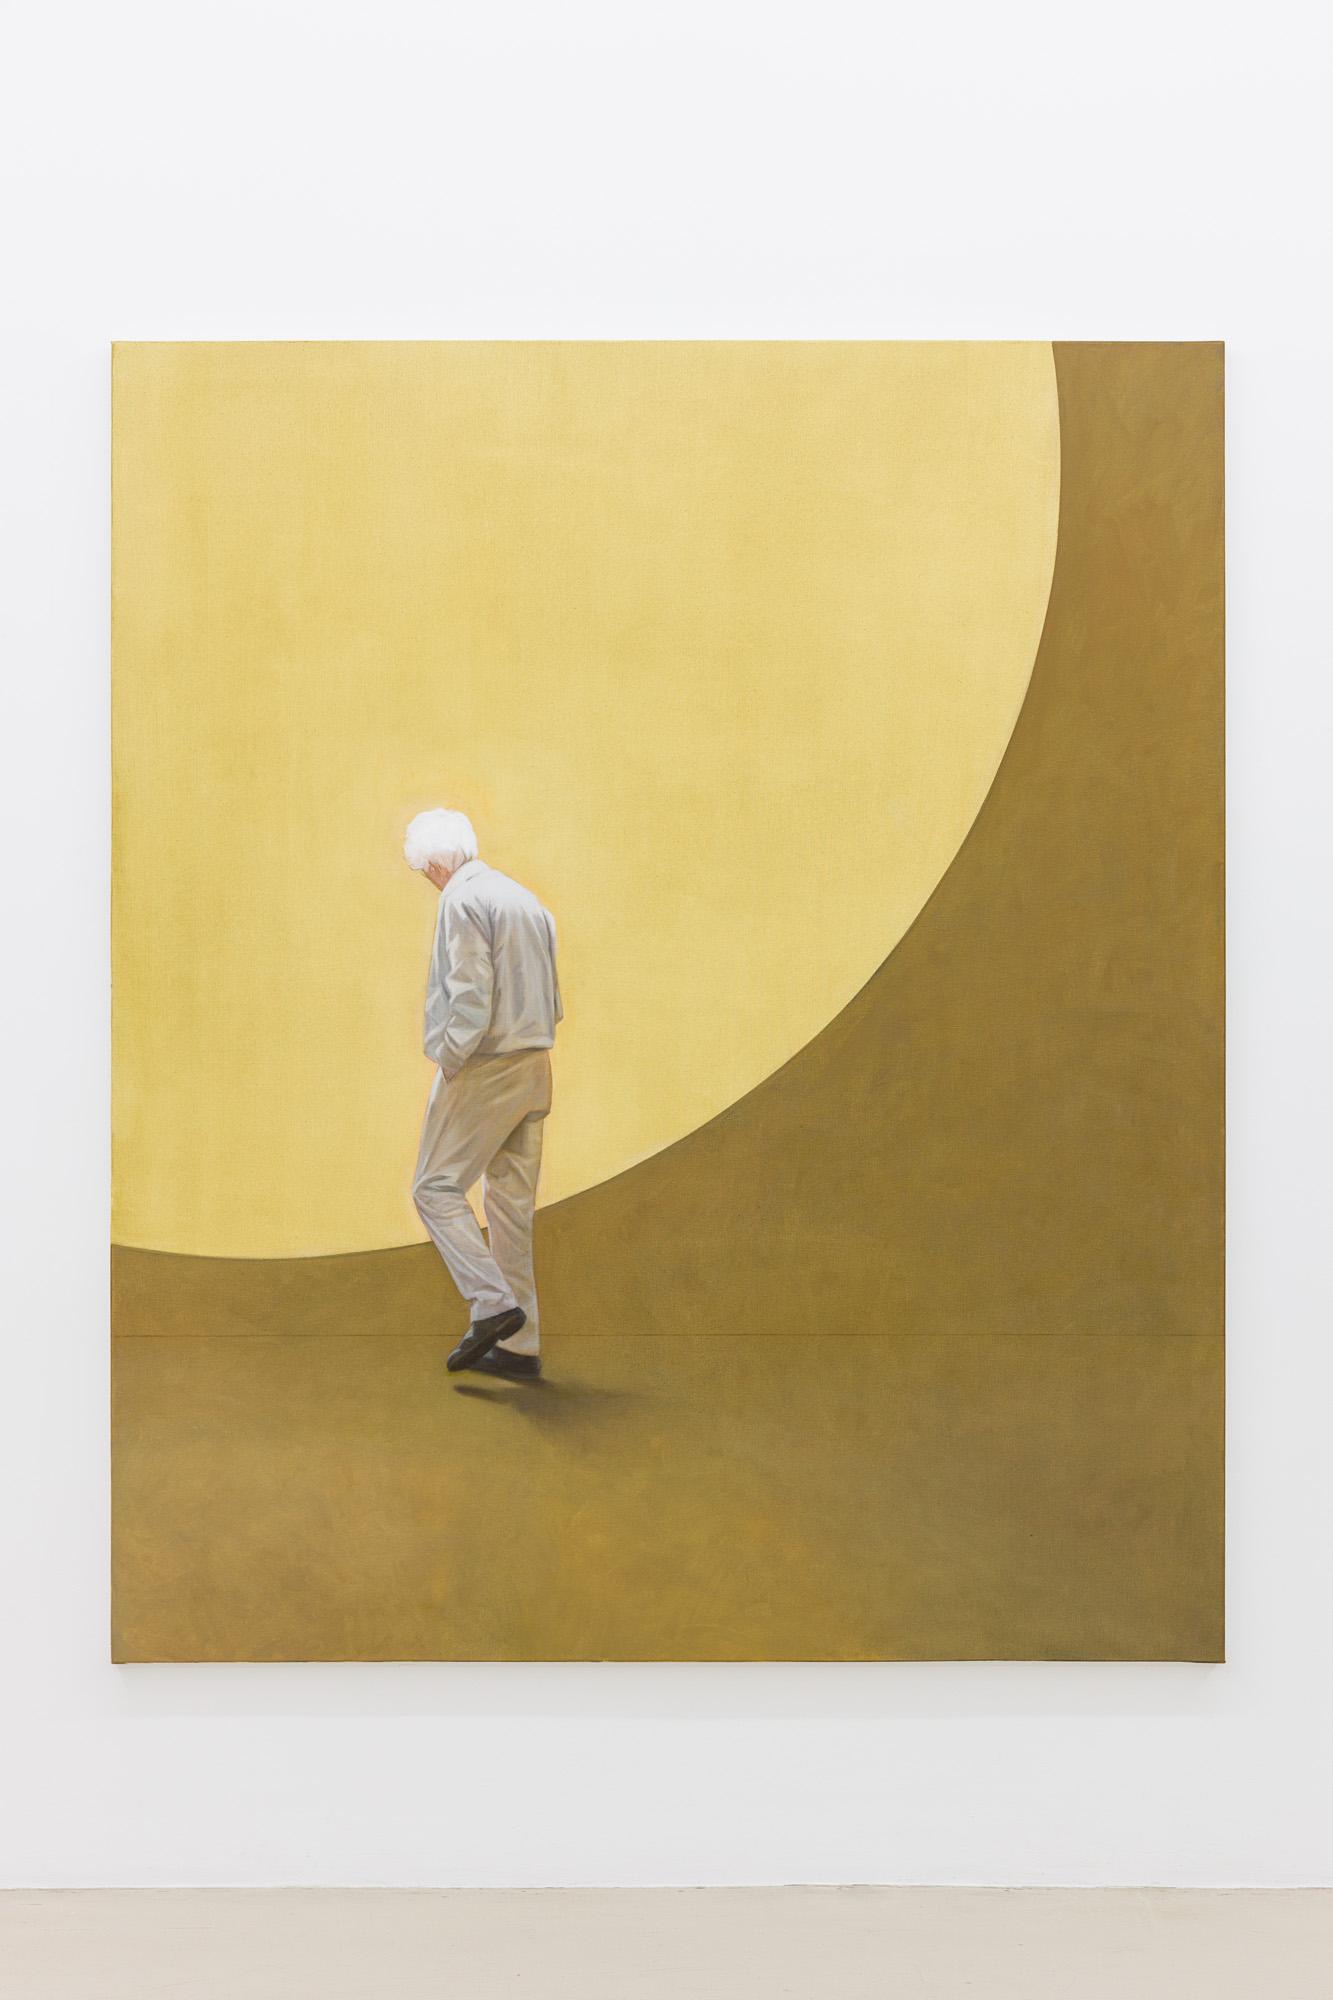 Tim_Eitel-Open_Circle-2017-huile_sur_toile_190x160cm